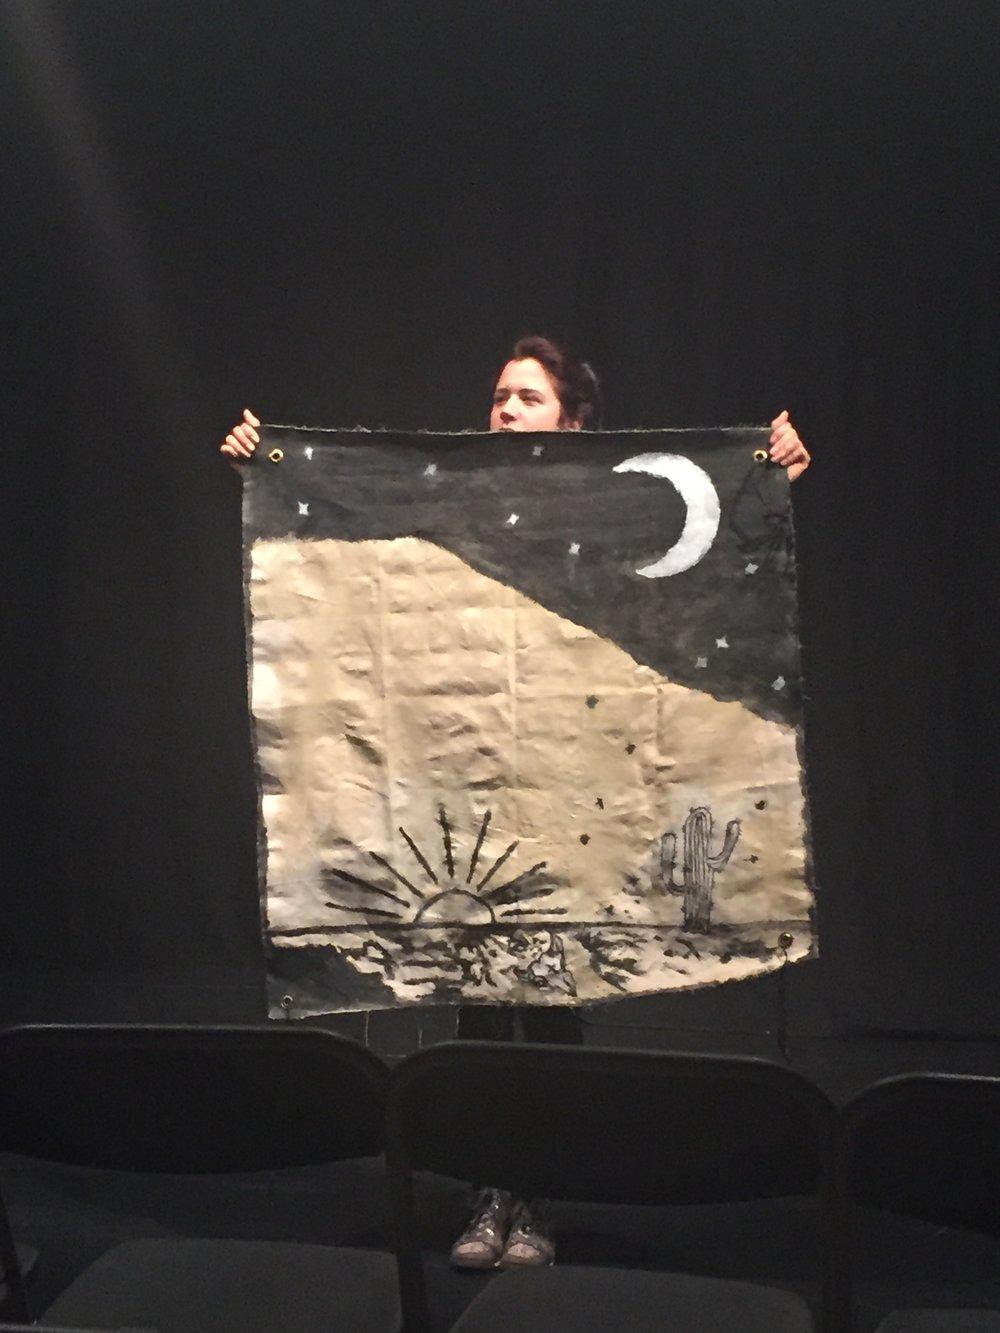 Natasa holding up the desert landscape pre-show.